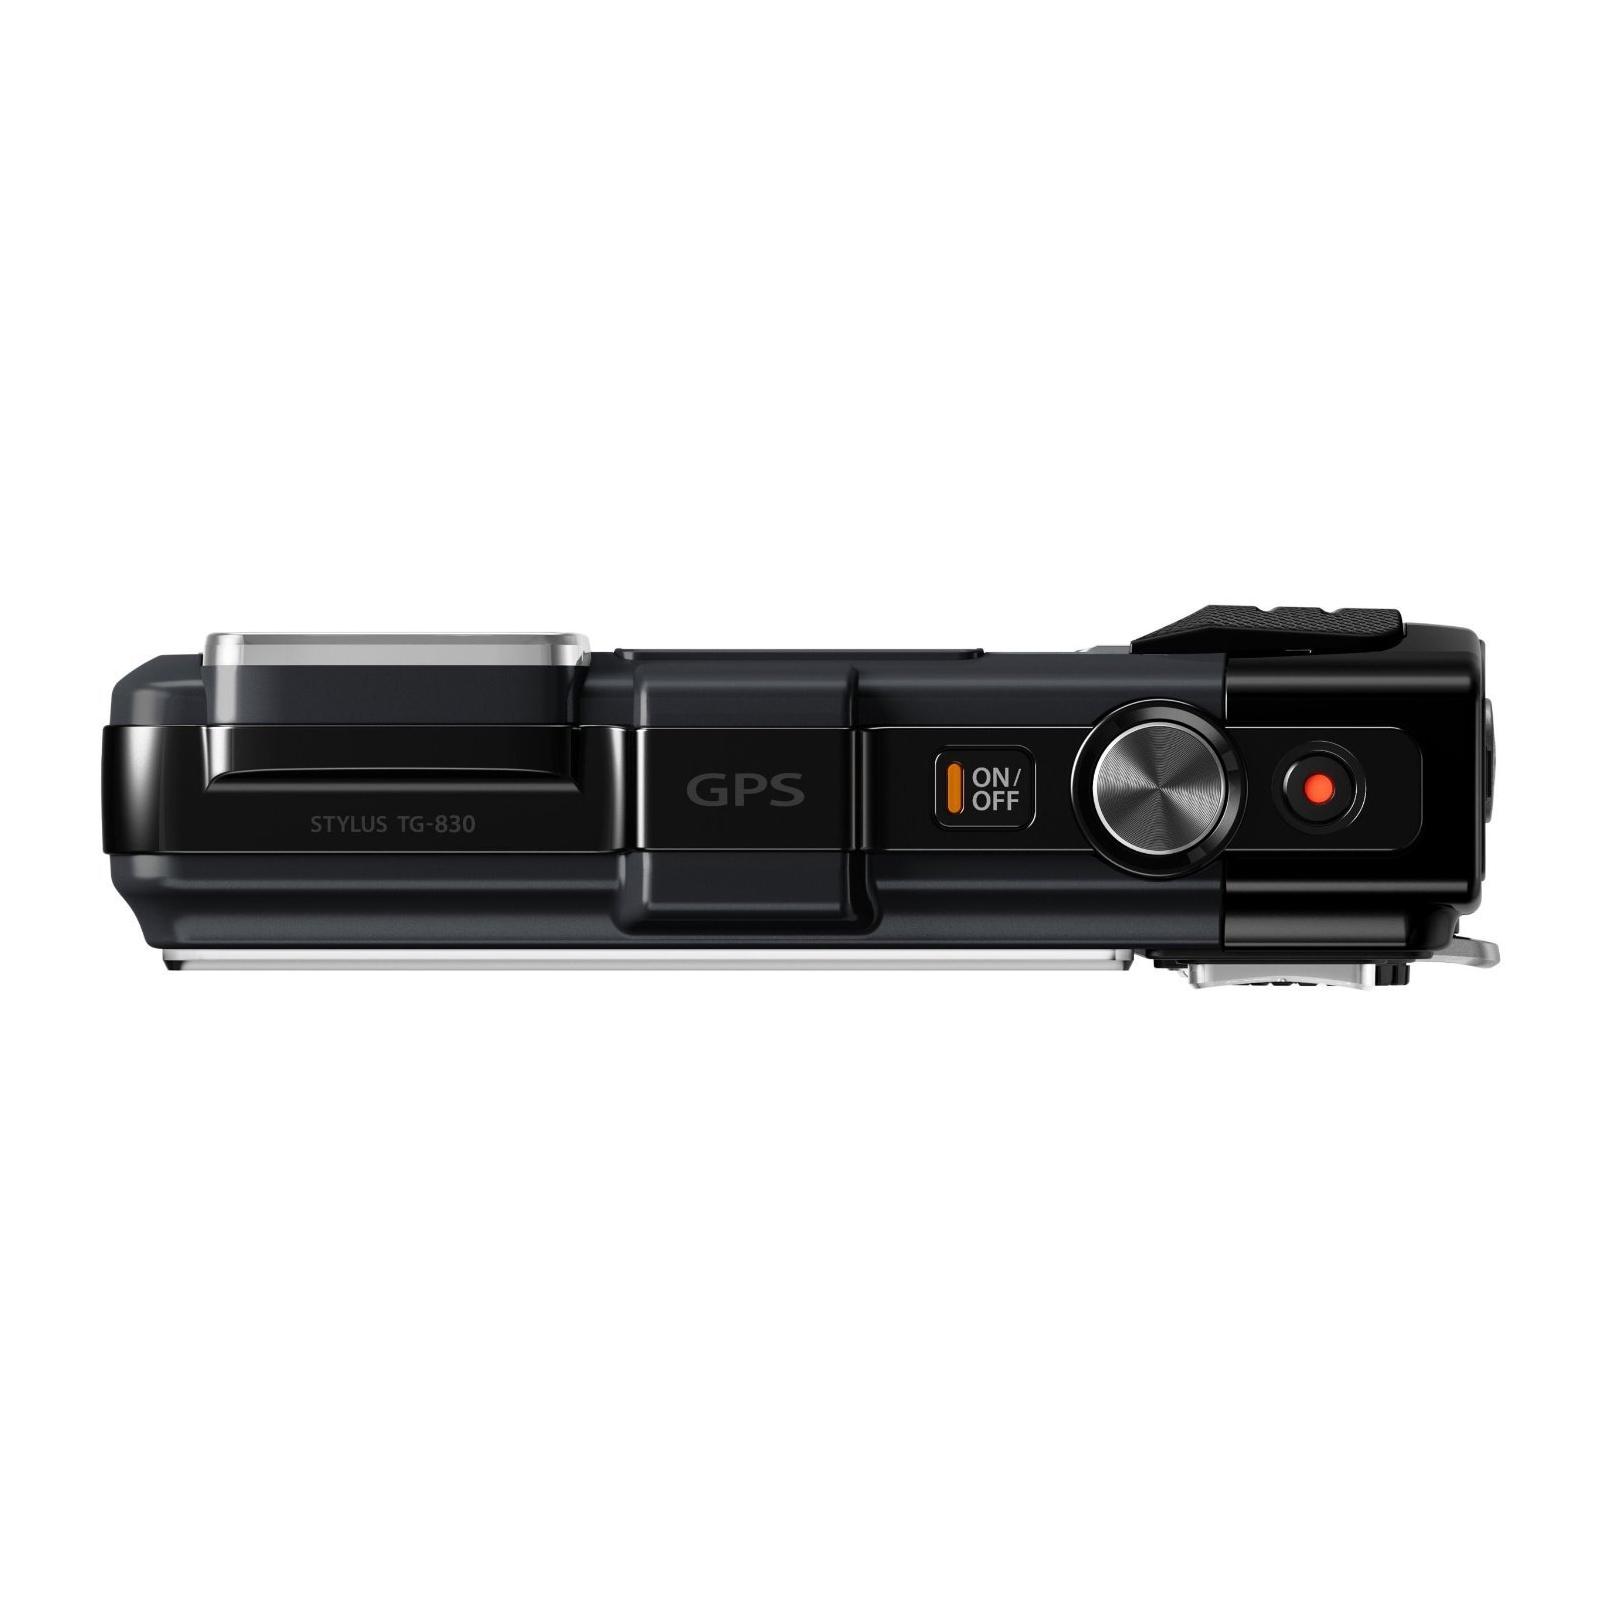 Цифровой фотоаппарат OLYMPUS TG-835 Black (Waterproof - 10m; GPS) (V104131BE000) изображение 5